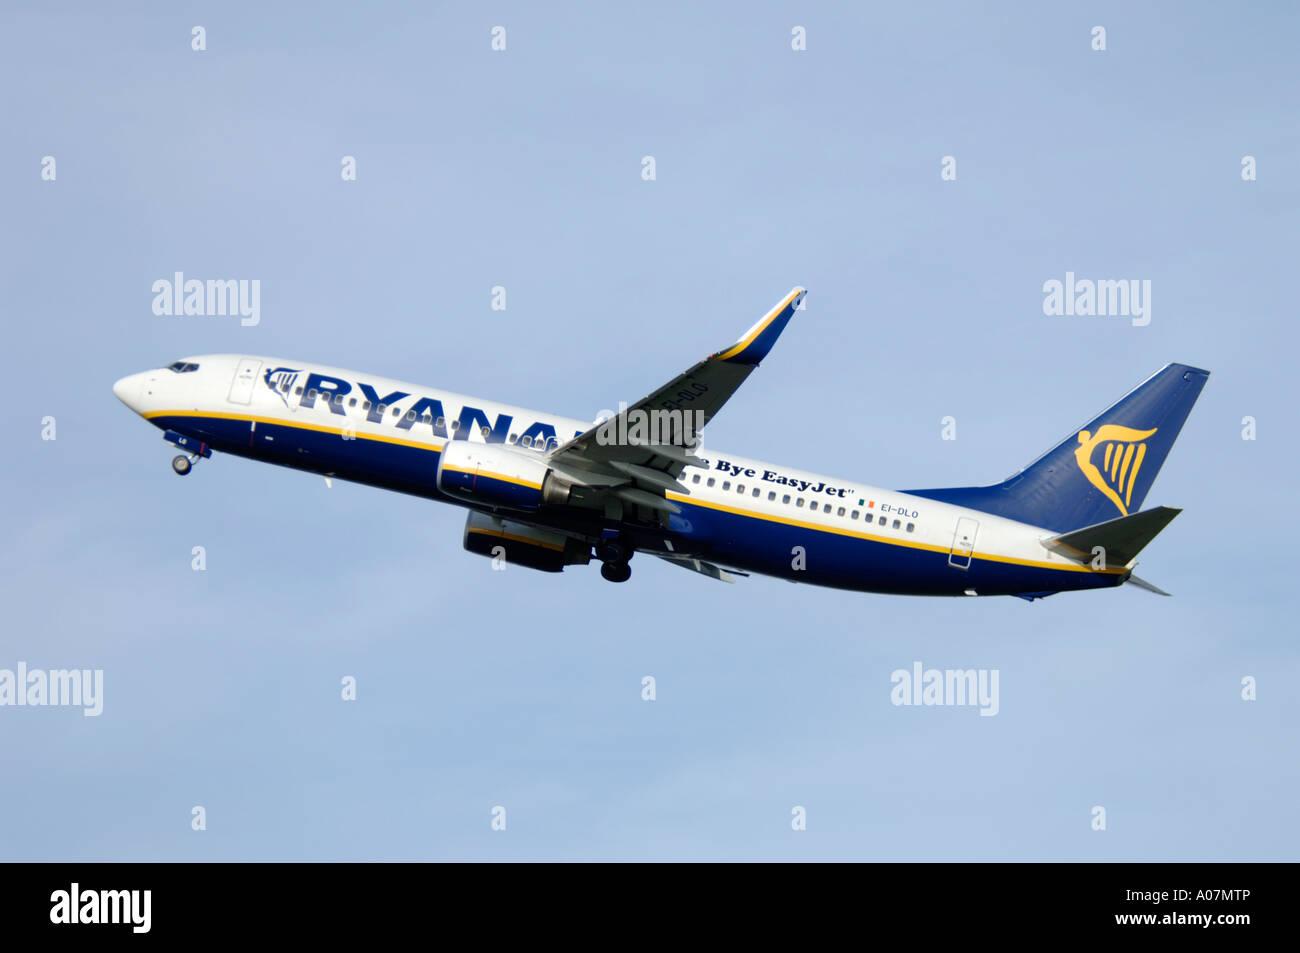 Ryanair Boeing 737-8AS departing Inverness, Dalcross, Scotland.   XAV 3983-379 - Stock Image